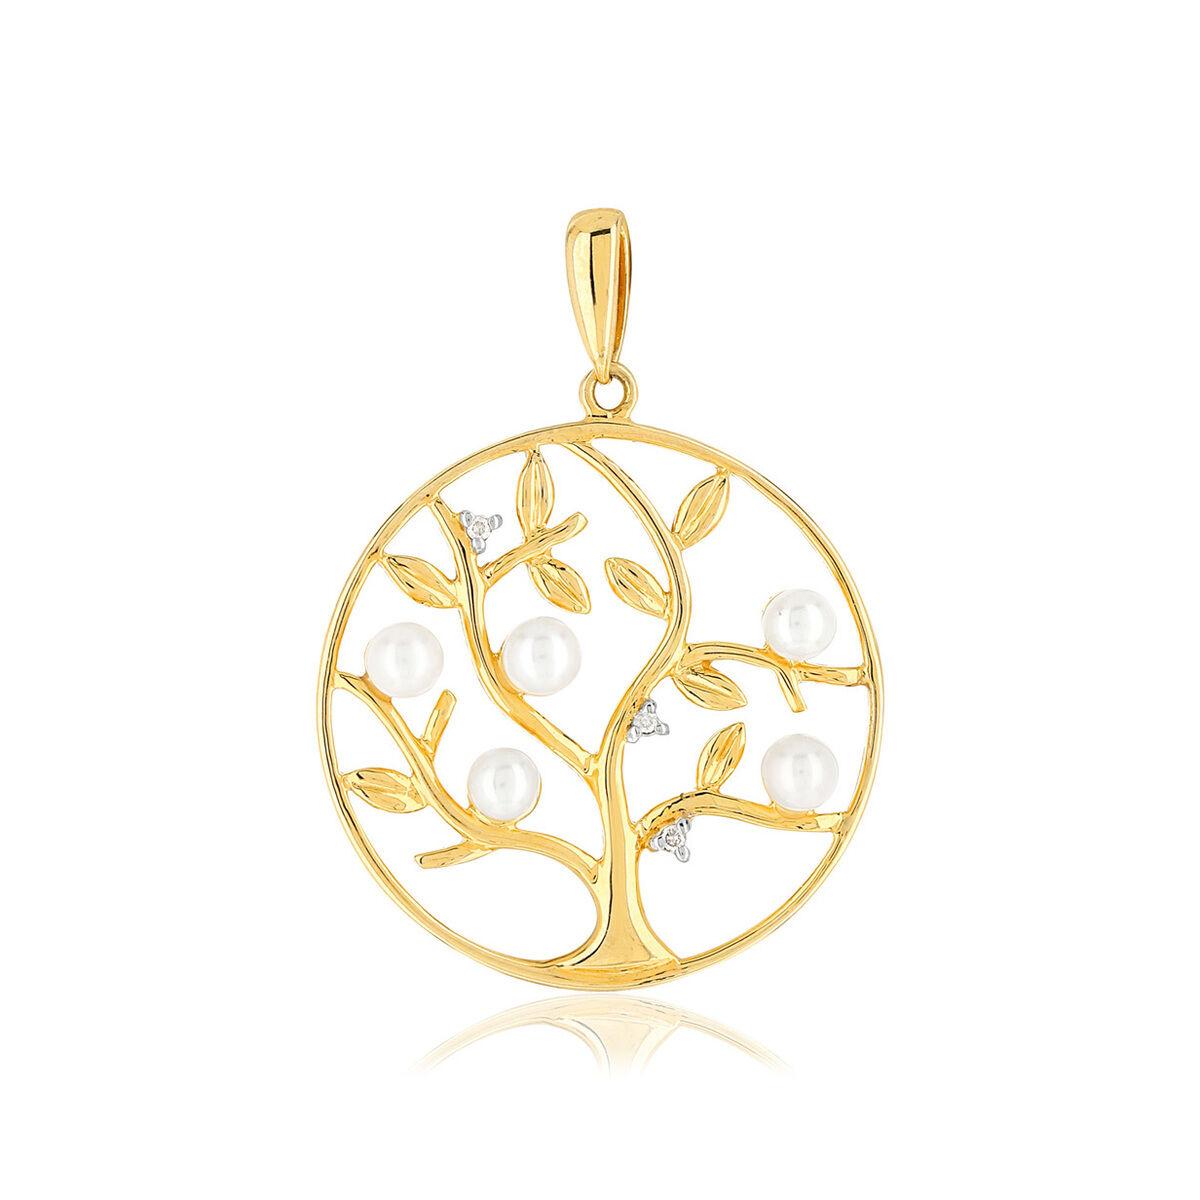 MATY Pendentif or 375 jaune arbre de vie perles de culture de Chine et diamants- MATY